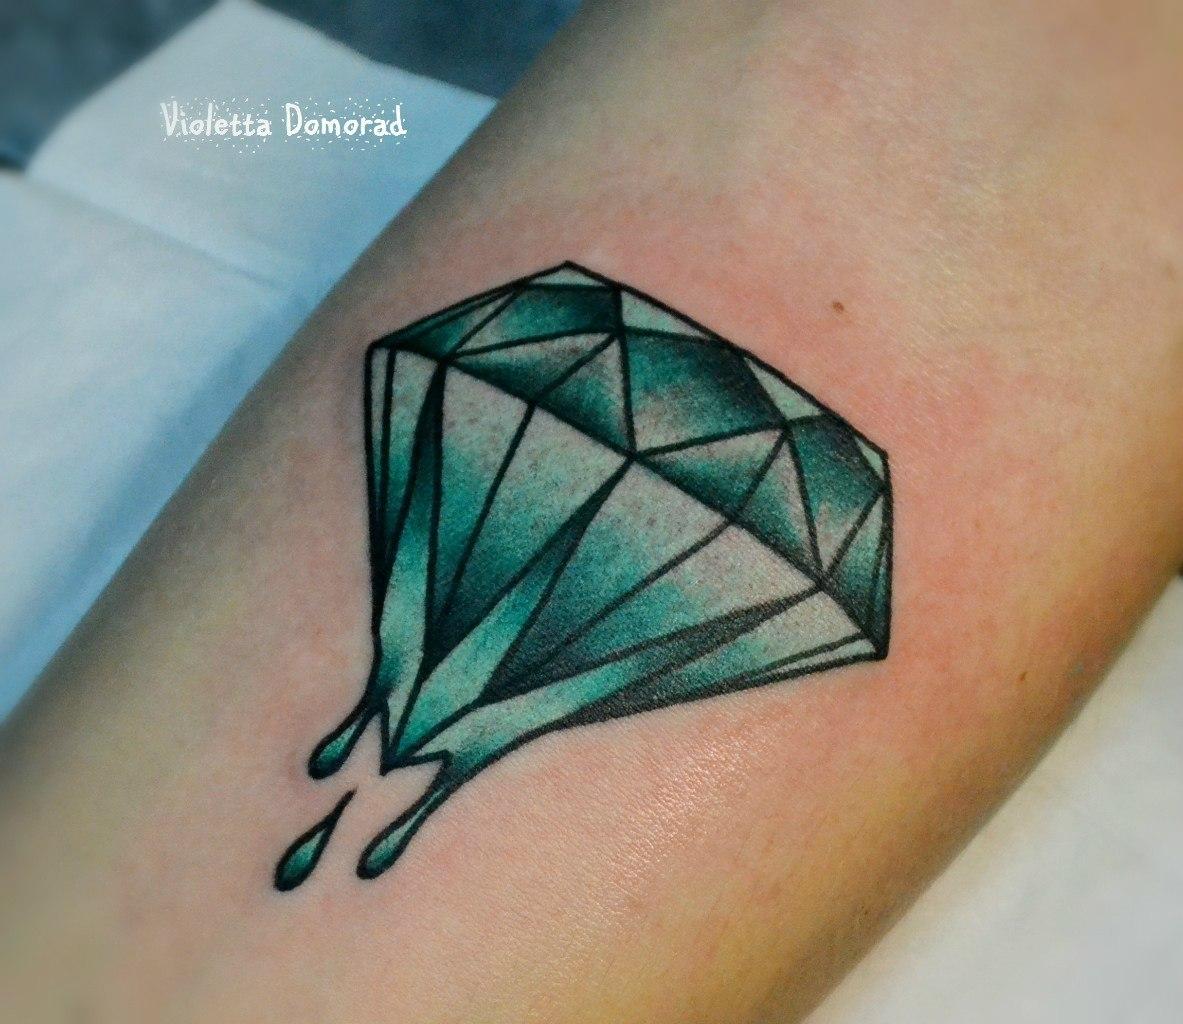 Татуировка камень изумруд. Мастер Виолетта Доморад.